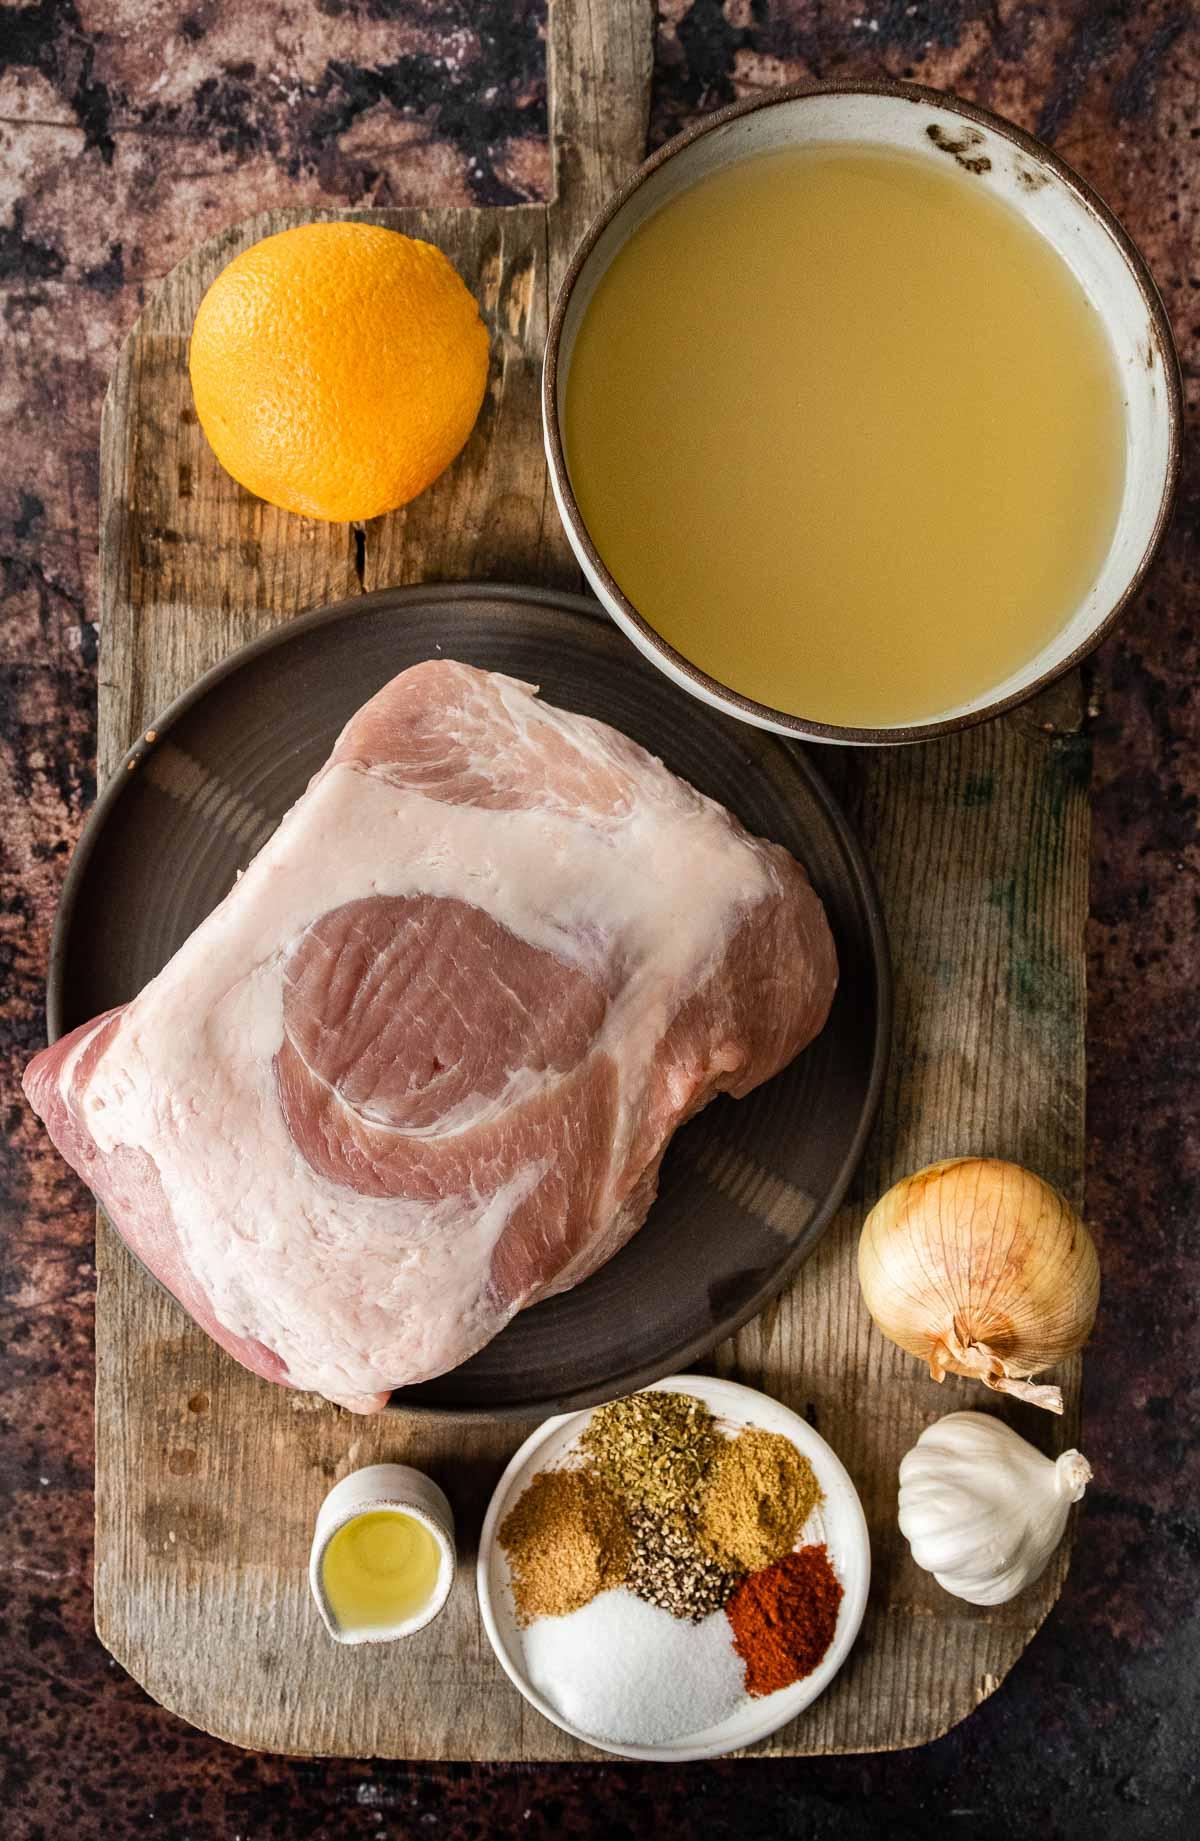 Ingredients for Pork Carnitas (Oven) in prep bowls